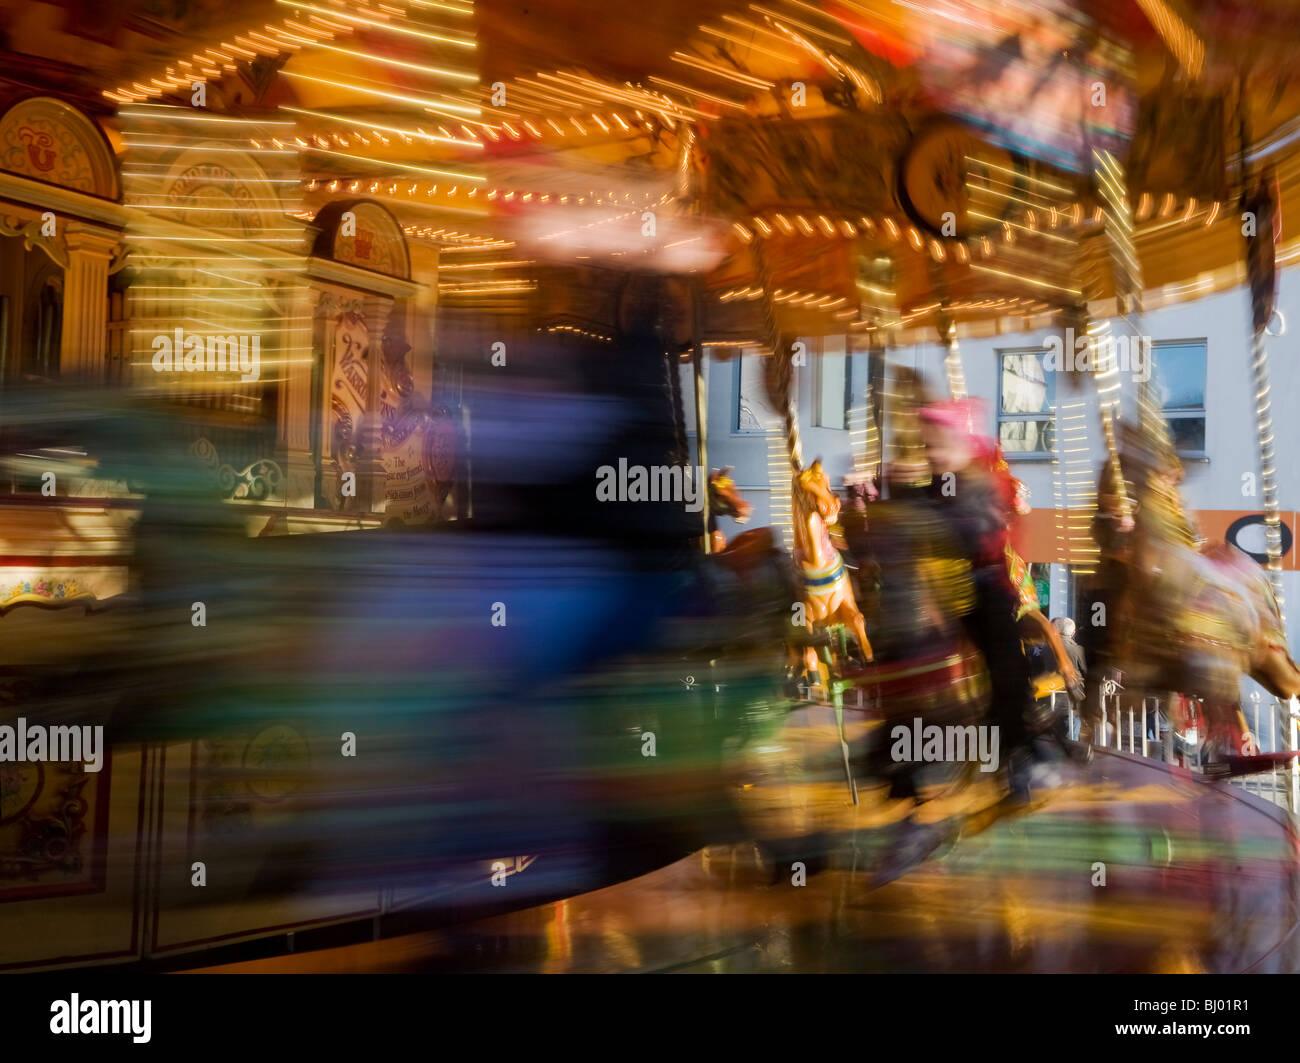 Fairground Carousel in Broad Street, Waterford City, Ireland Stock Photo